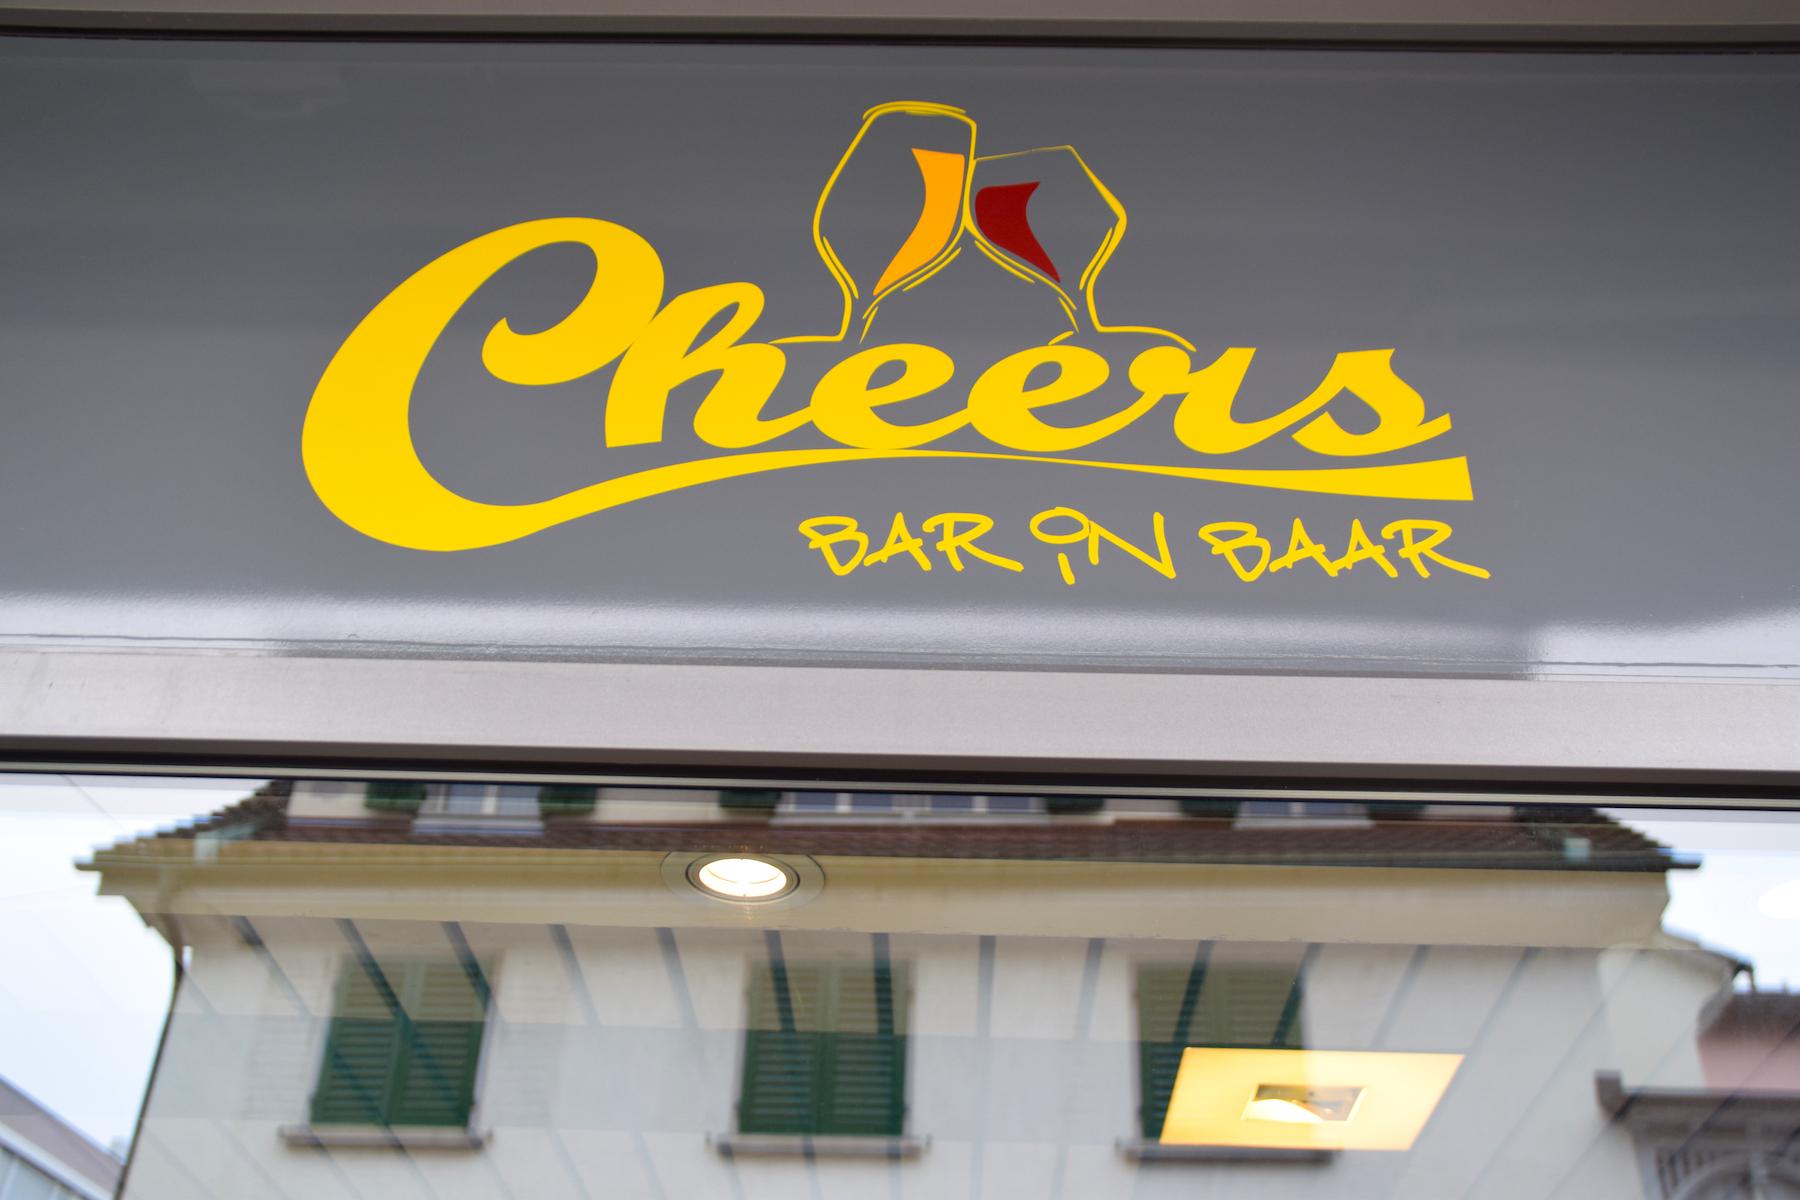 Bar in Baar: das Cheers.